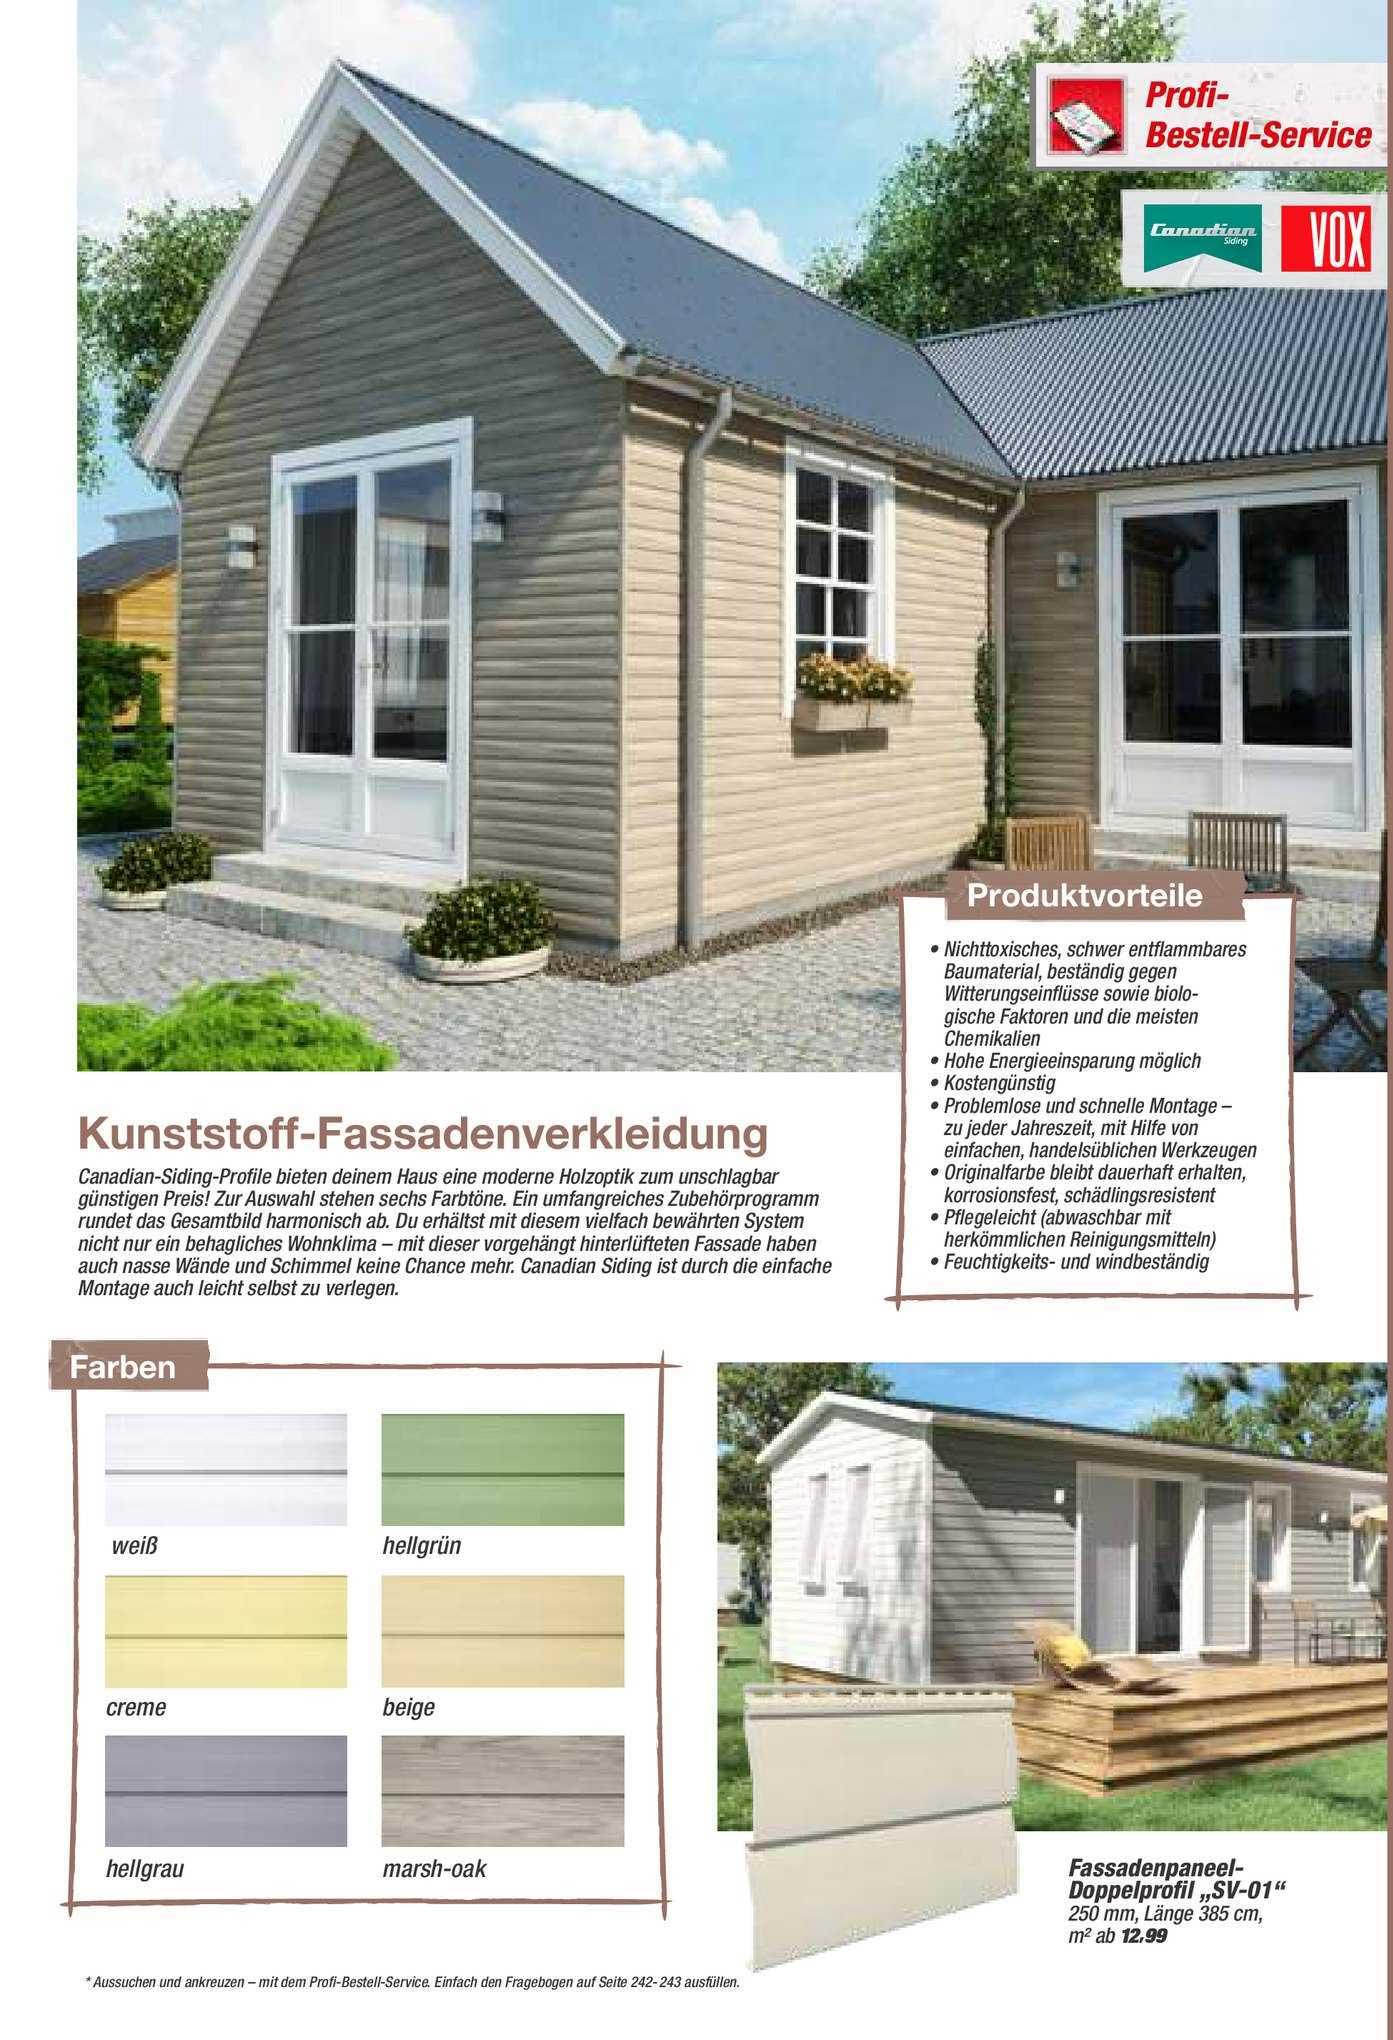 Toom Baumarkt Kunststoff Fassadenverkleidung